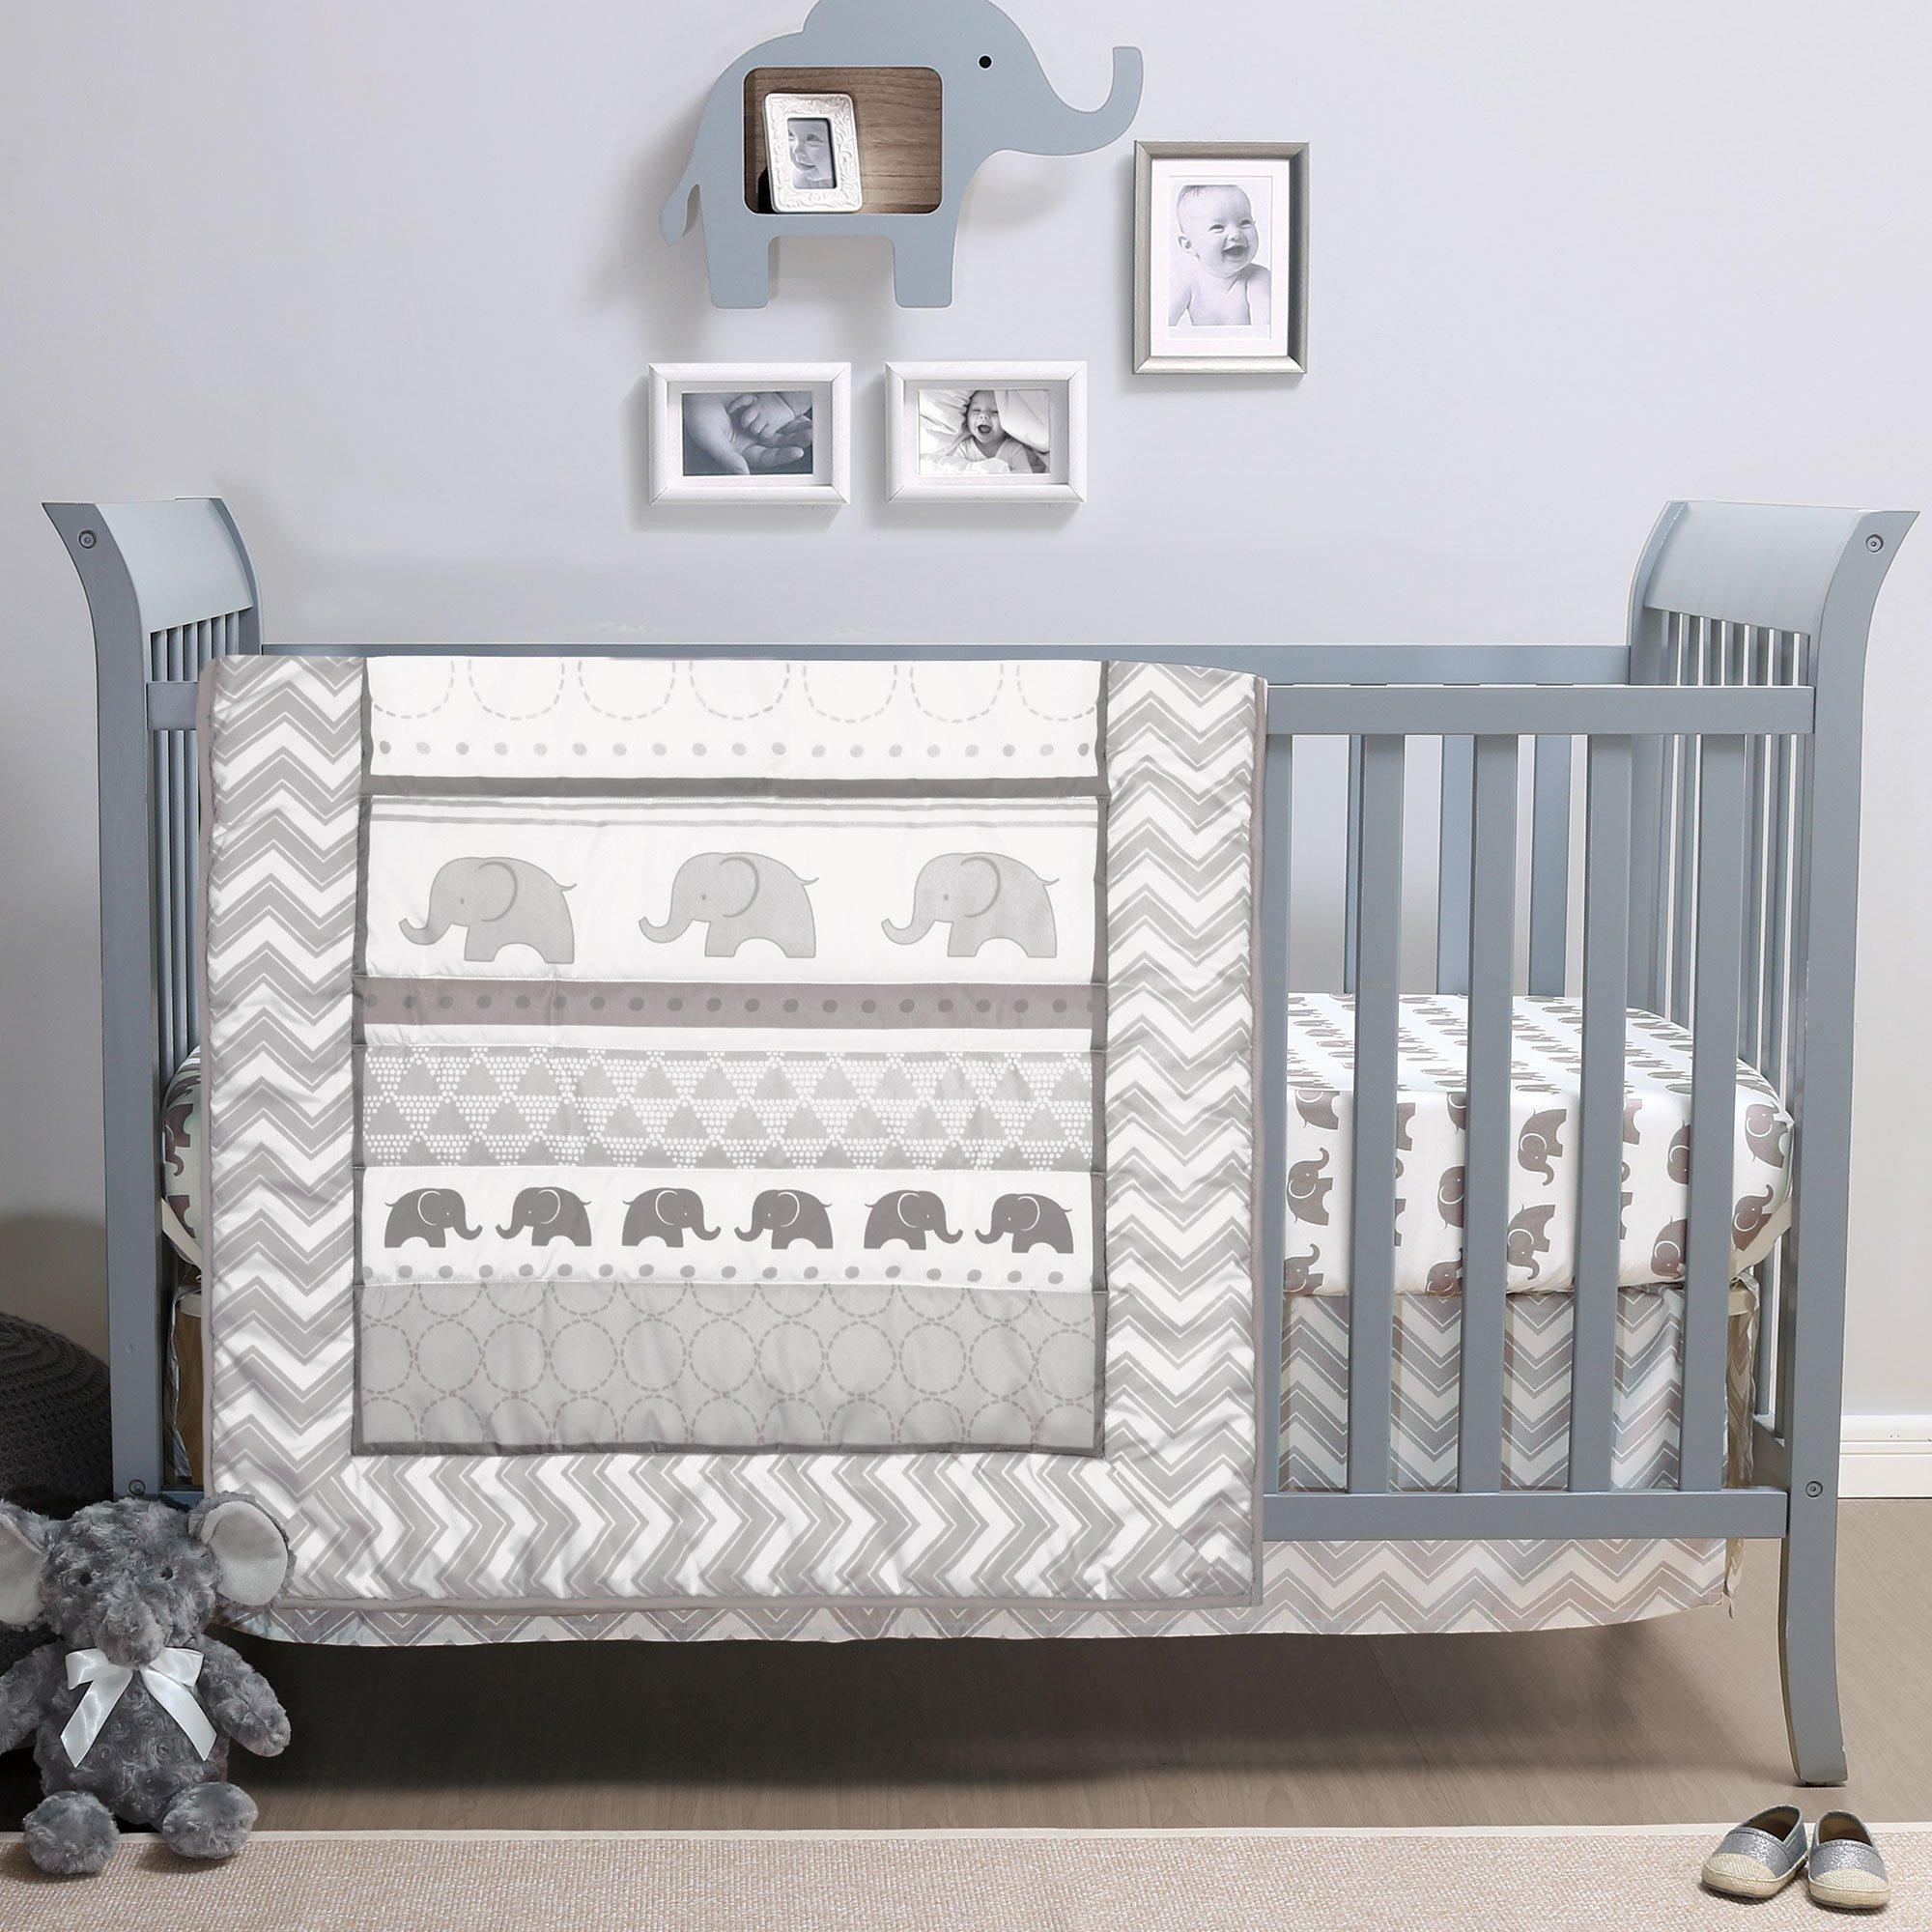 Elephant Walk 4-Piece Jungle Geometric Chevron Grey Baby Crib Bedding Set by Belle by Belle